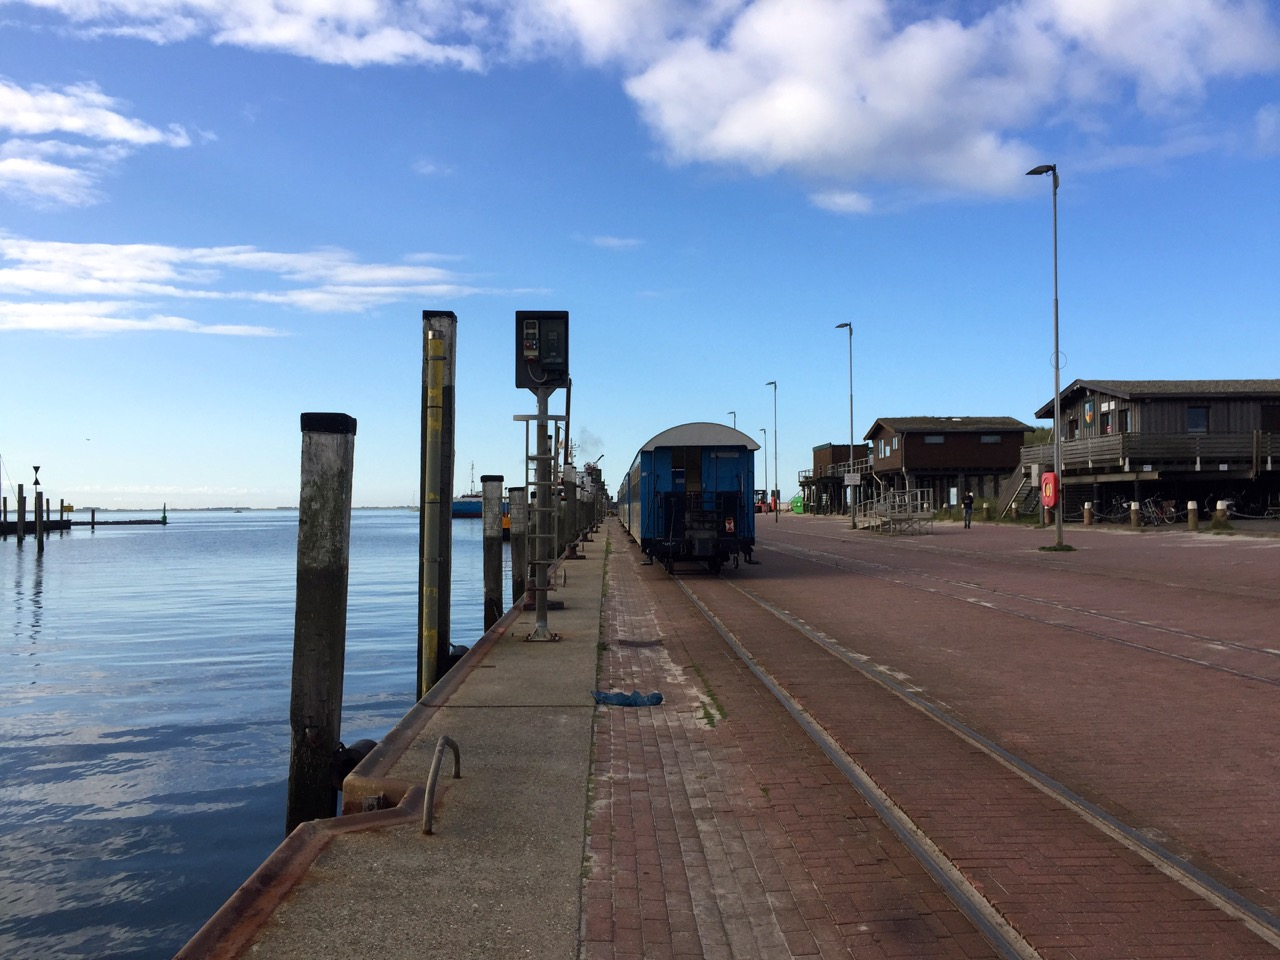 Wangerooge Anreise – ankommen am Bahnhof